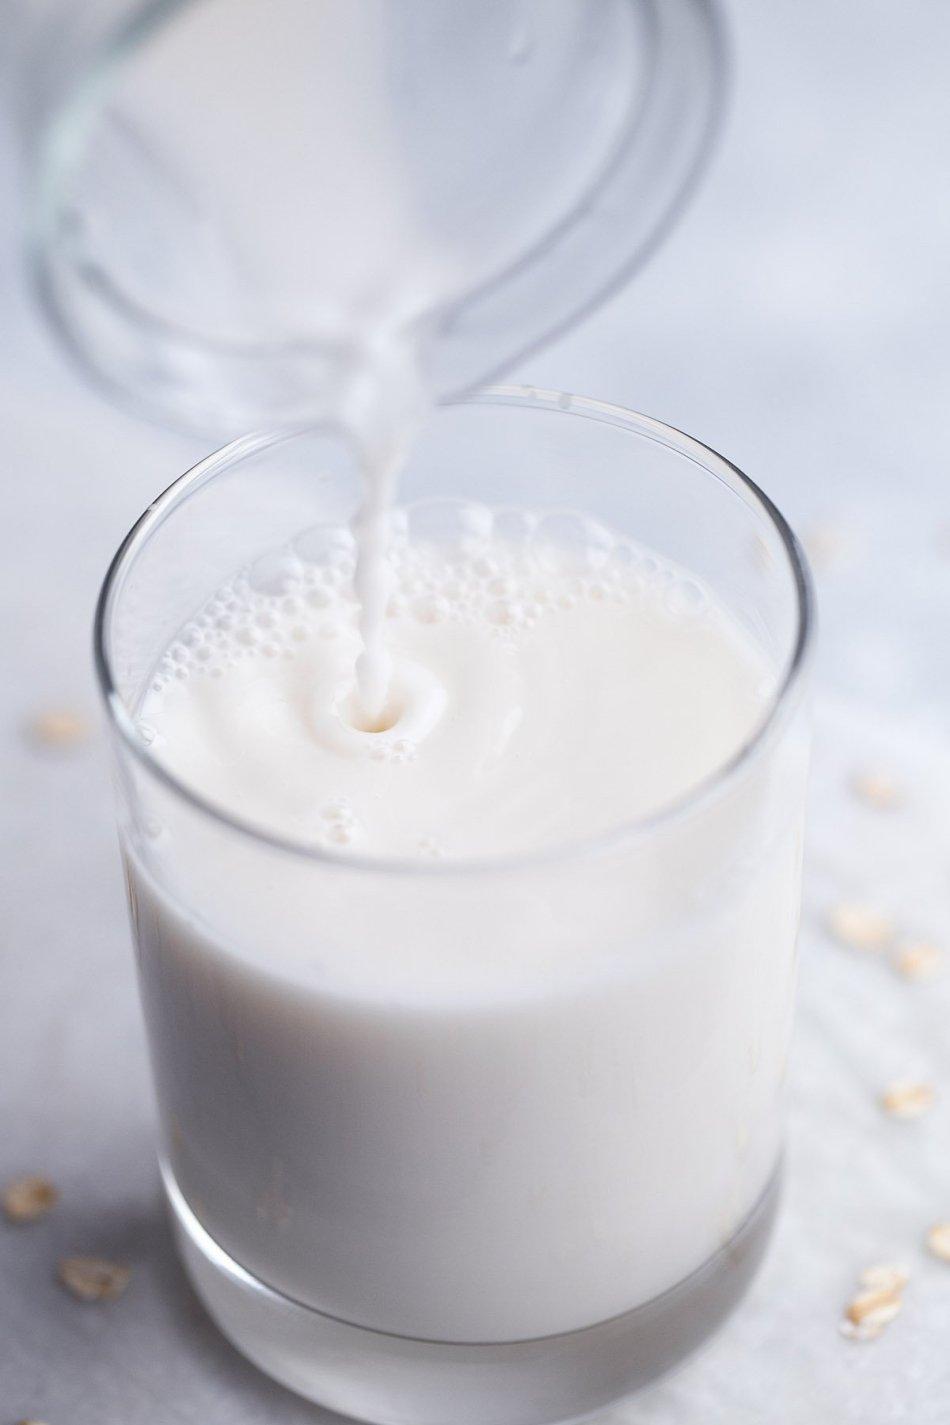 Homemade Oat Milk | Vegan Friendly, Free of Dairy, Gluten, ad Refined Sugar